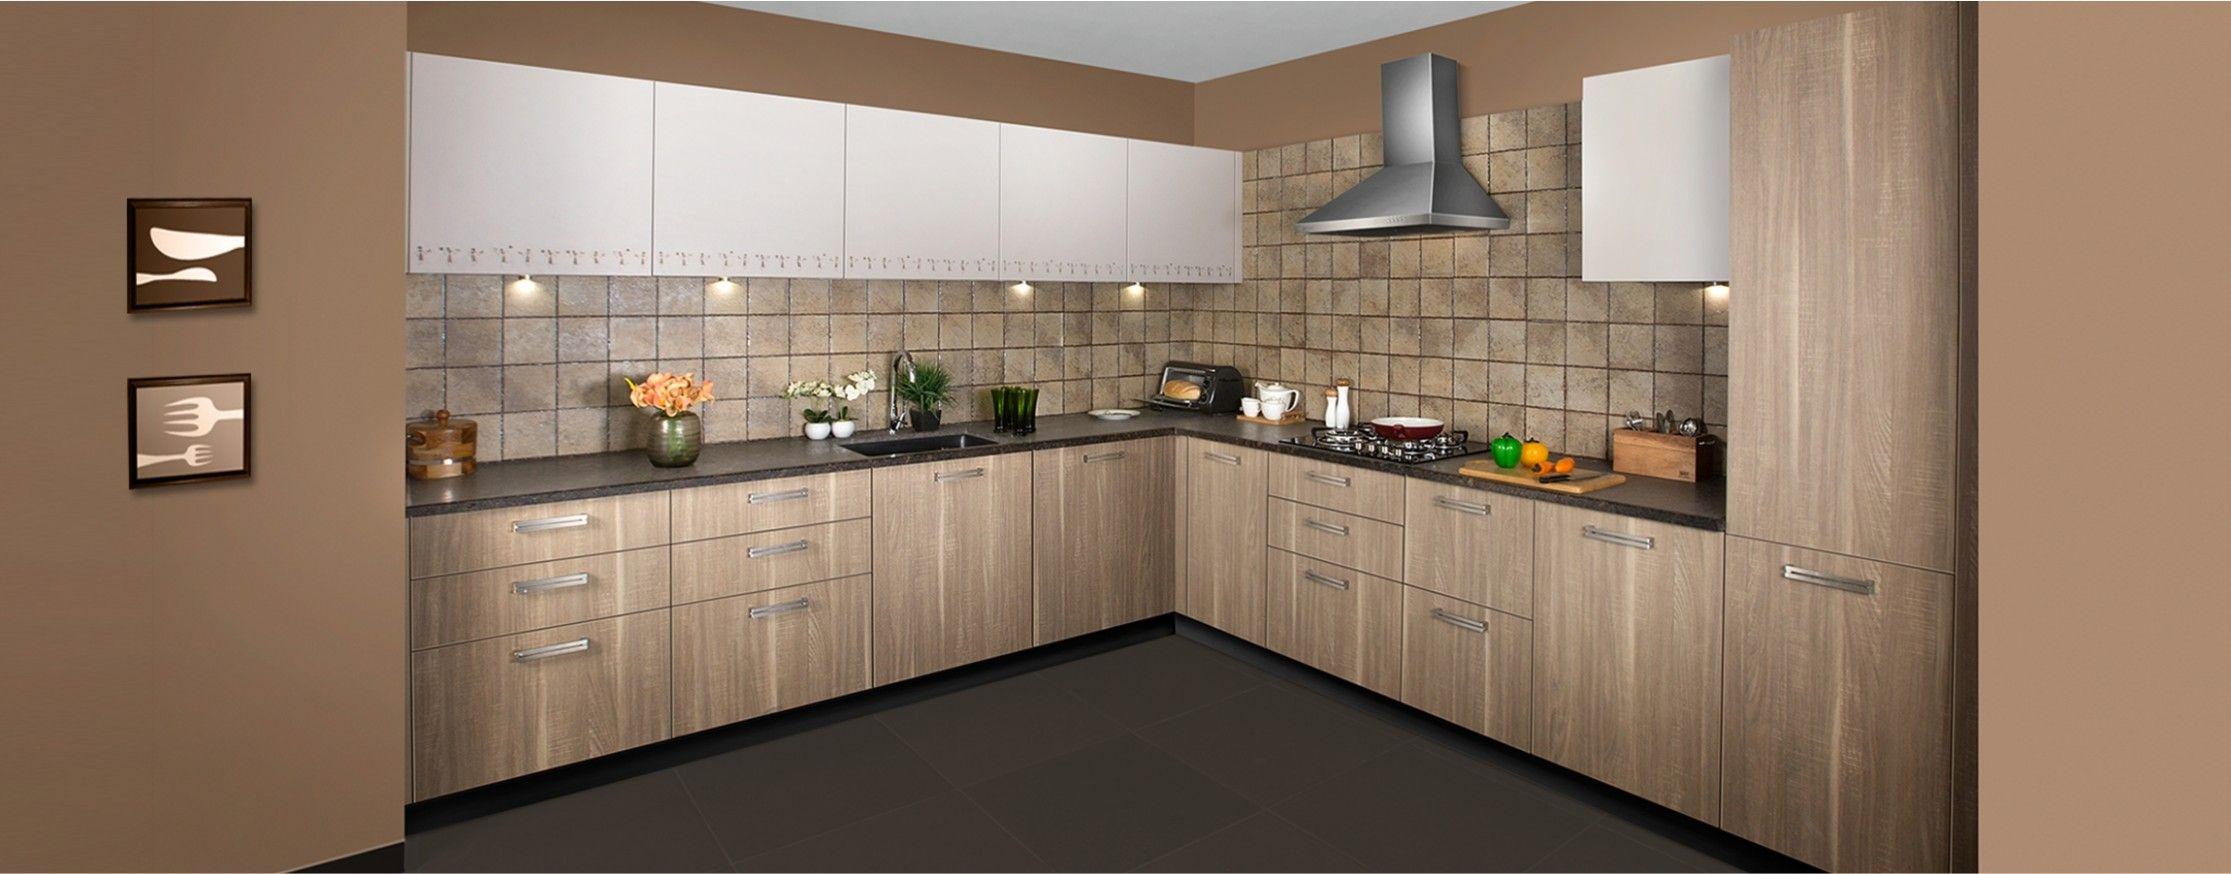 Most Effective Ways To Overcome Modular Kitchen Design ...